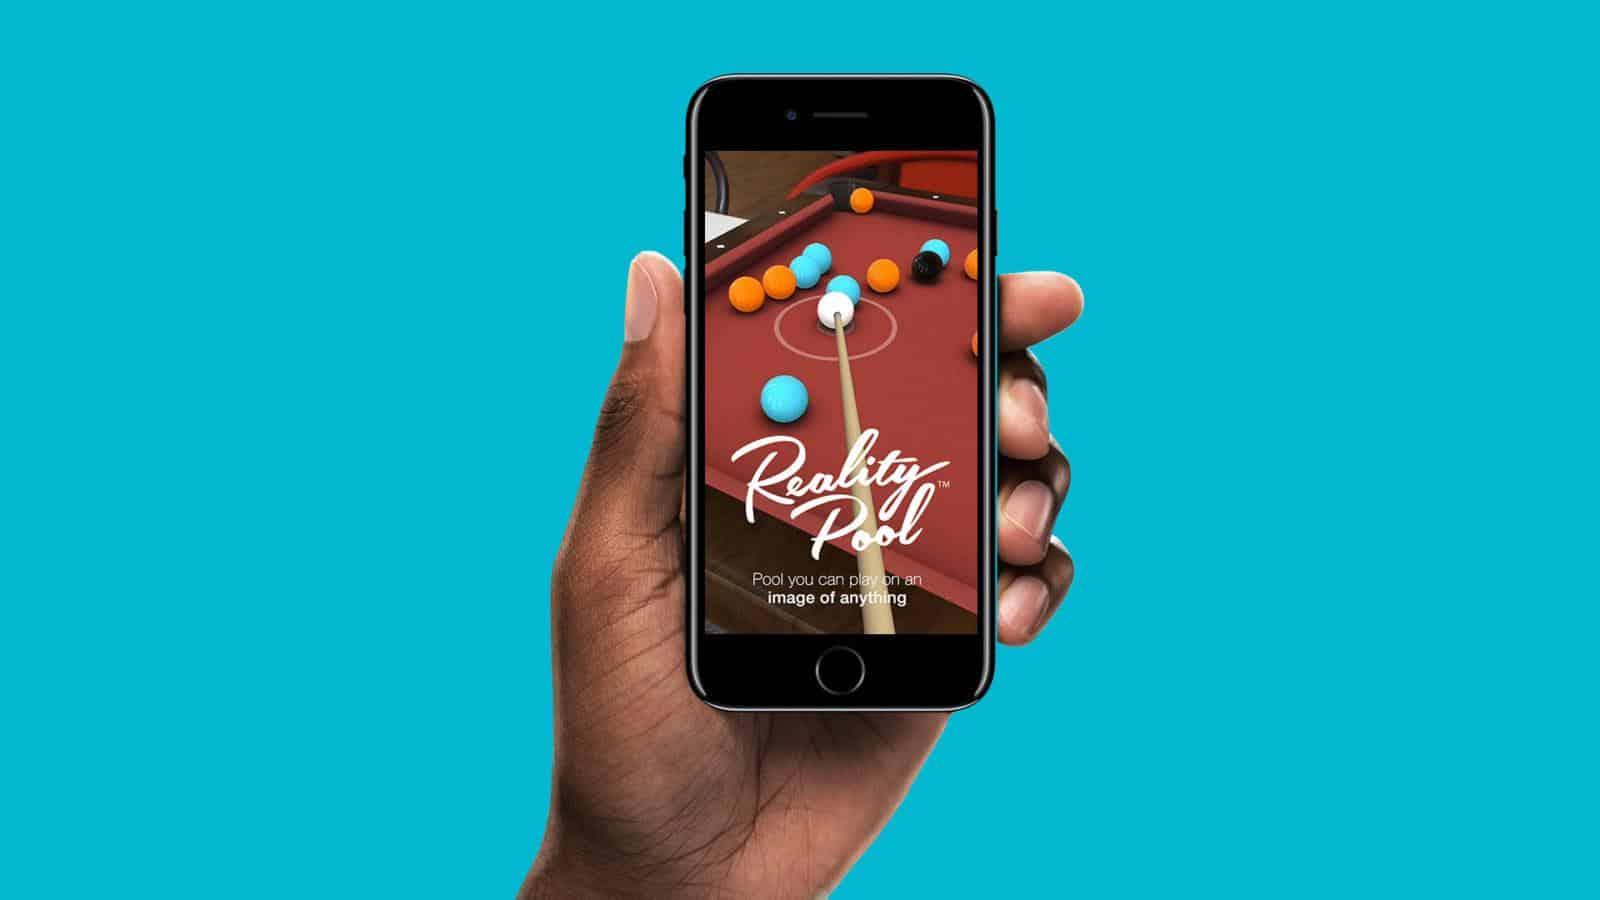 Reality Pool app